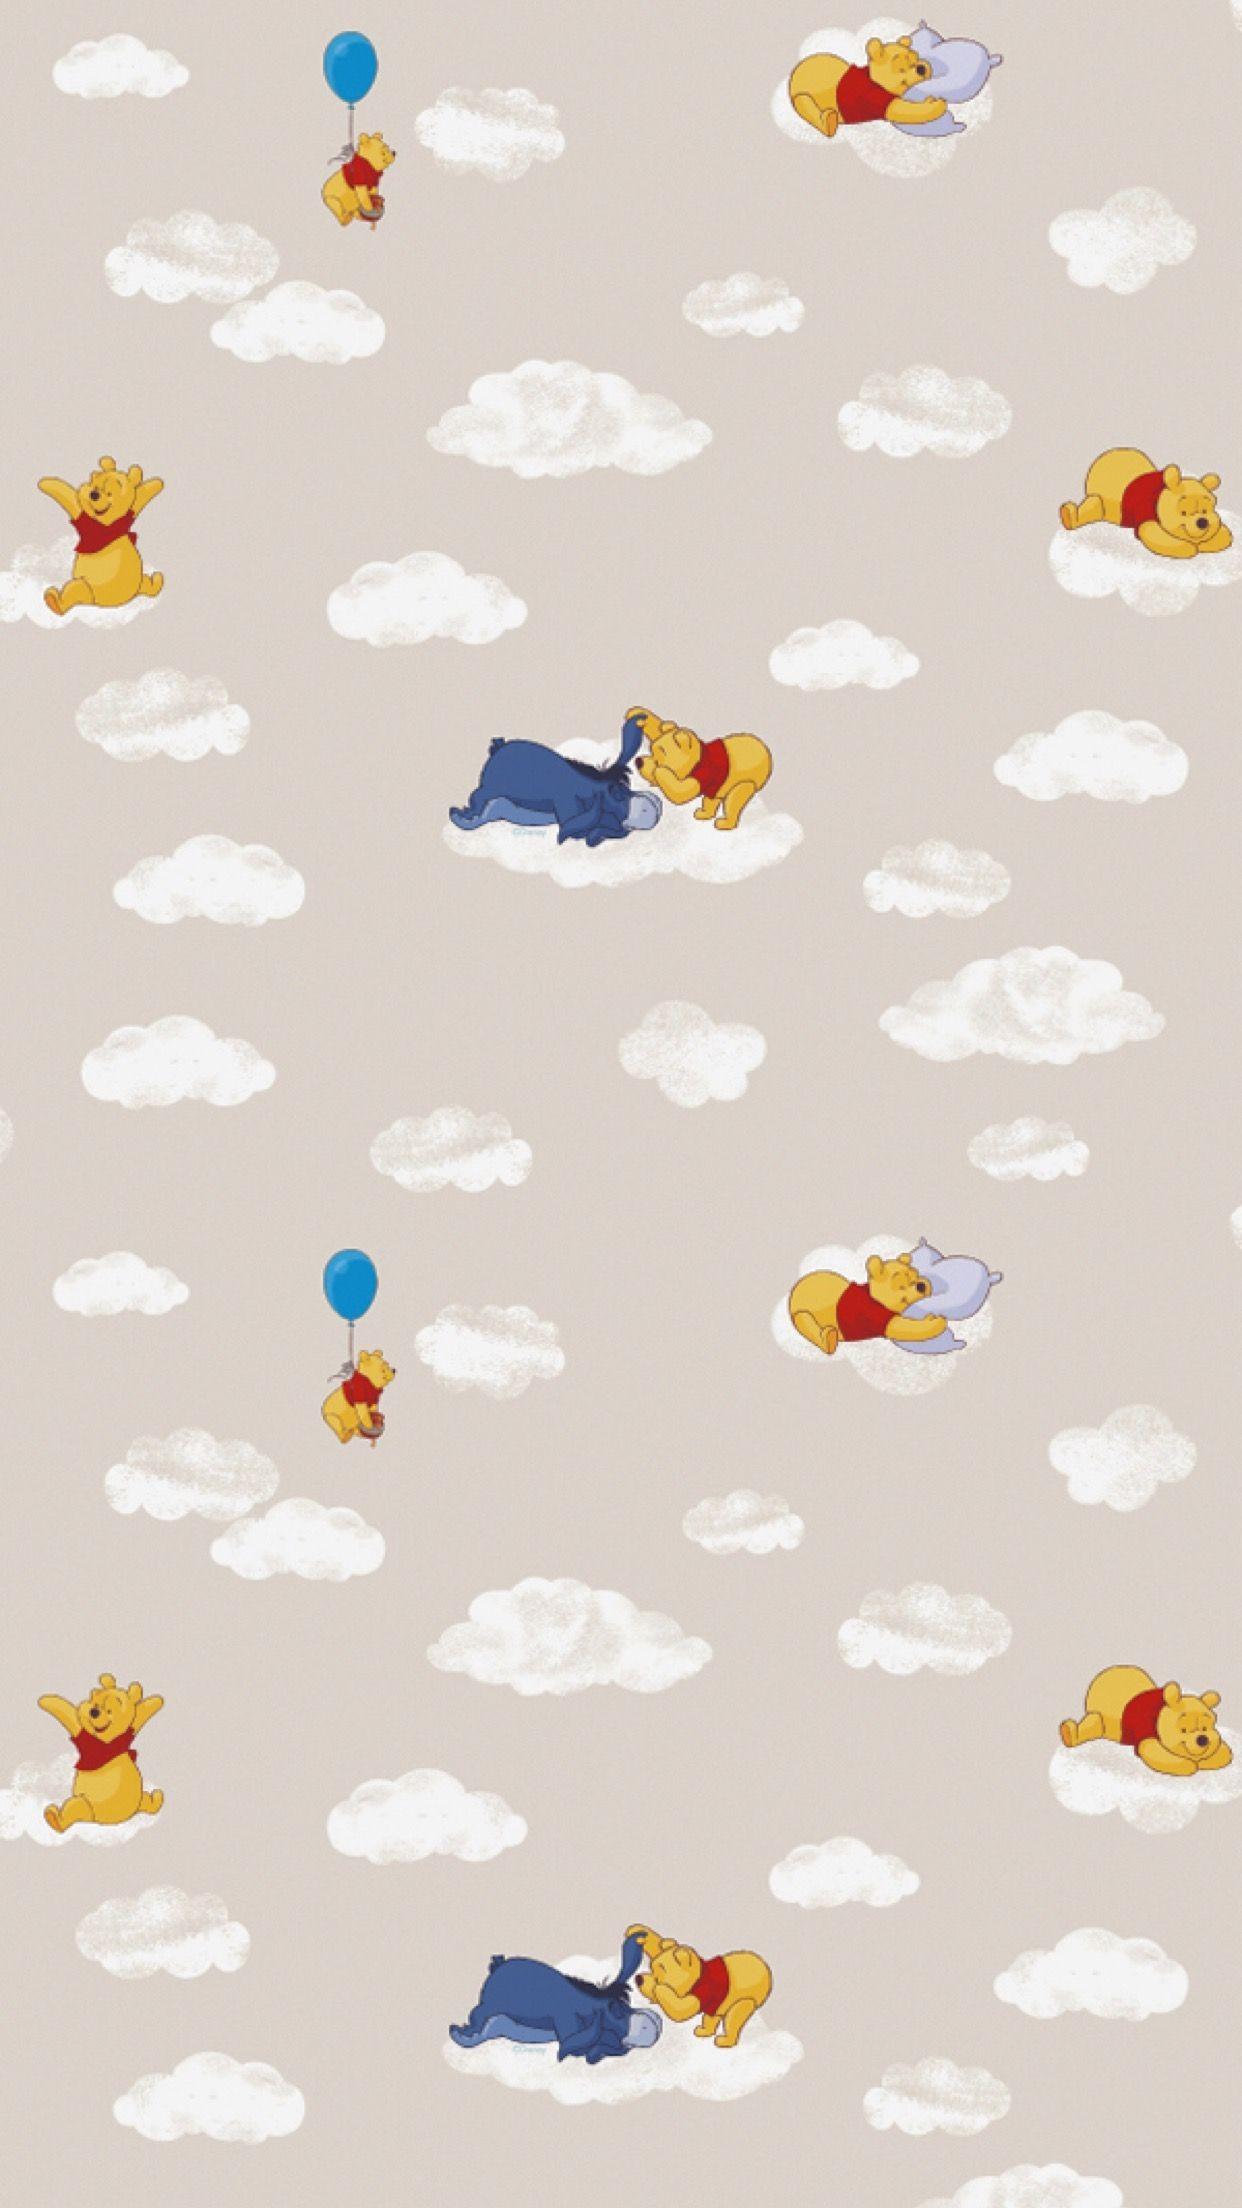 Res: 1242x2208, Pooh & Eeyore